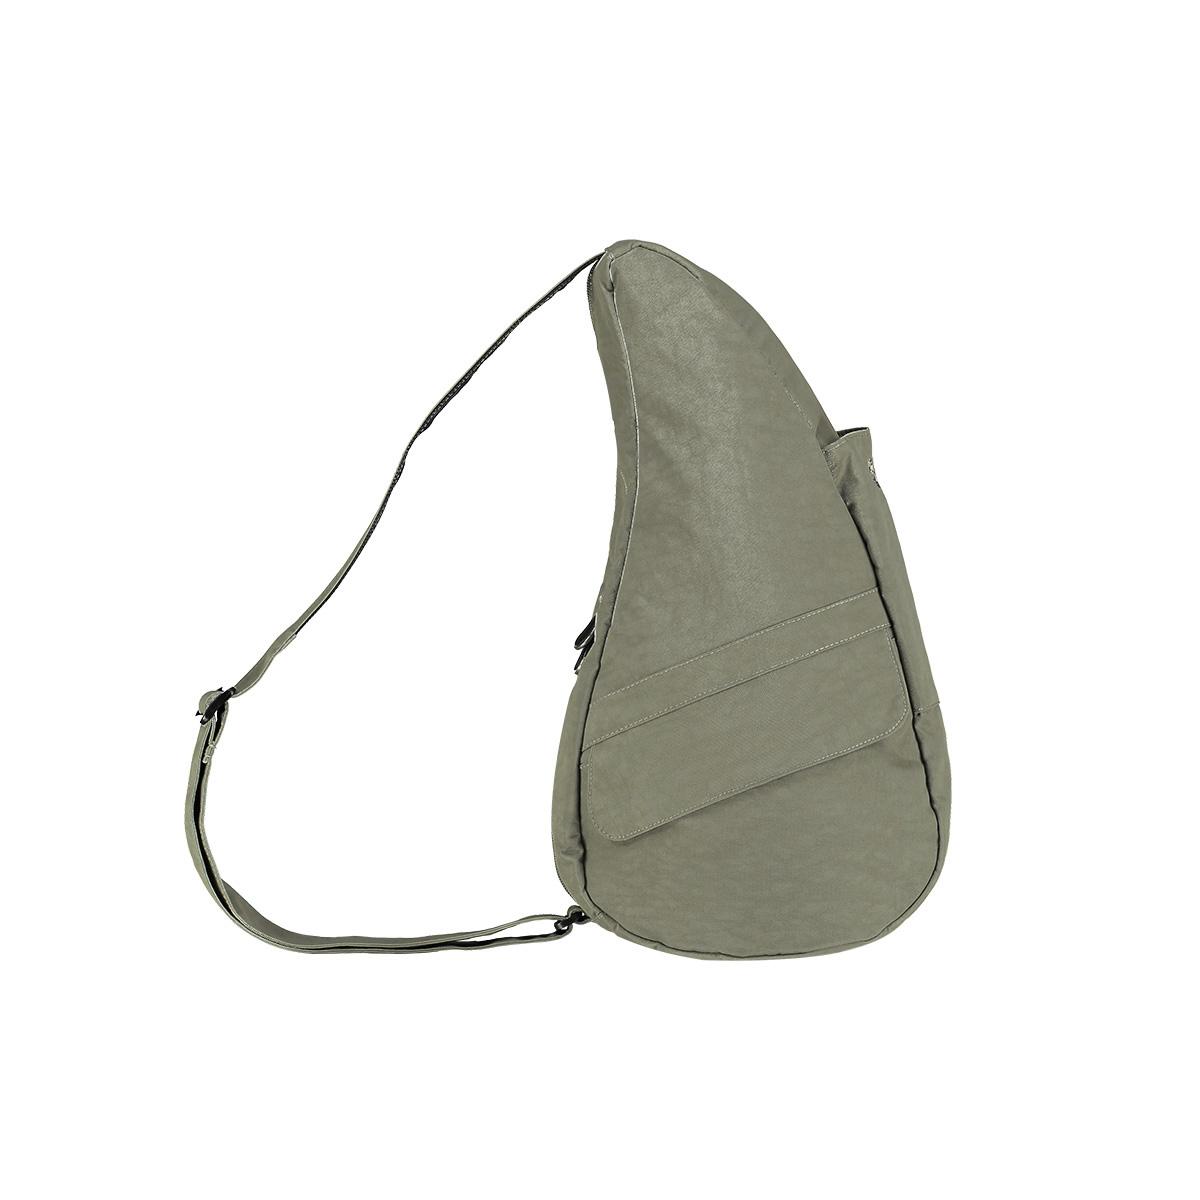 Healthy Back Bag/ヘルシーバックバッグ/ショルダーバッグ/ボディバッグ/旅行バッグ/軽量/レディース/メンズ 《限定ポーチ付》 公式ストア ヘルシーバックバッグ テクスチャードナイロン Sサイズ6303 セージ